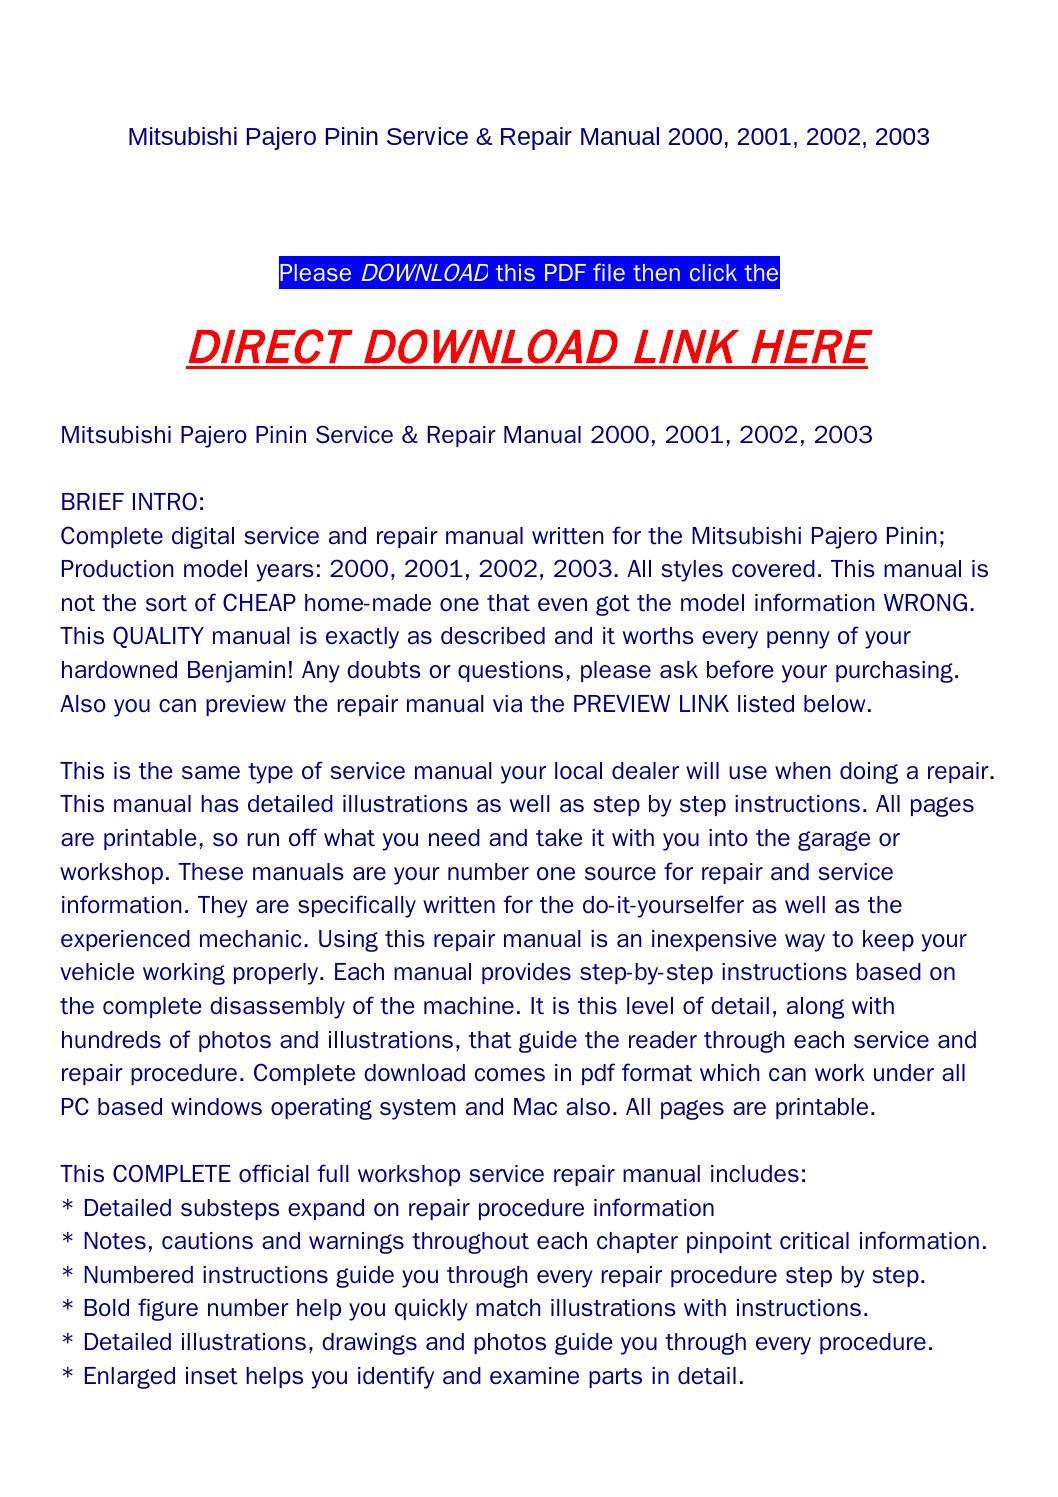 Mitsubishi pajero pinin service & repair manual 2000, 2001, 2002, 2003 by  goodmanami - issuu